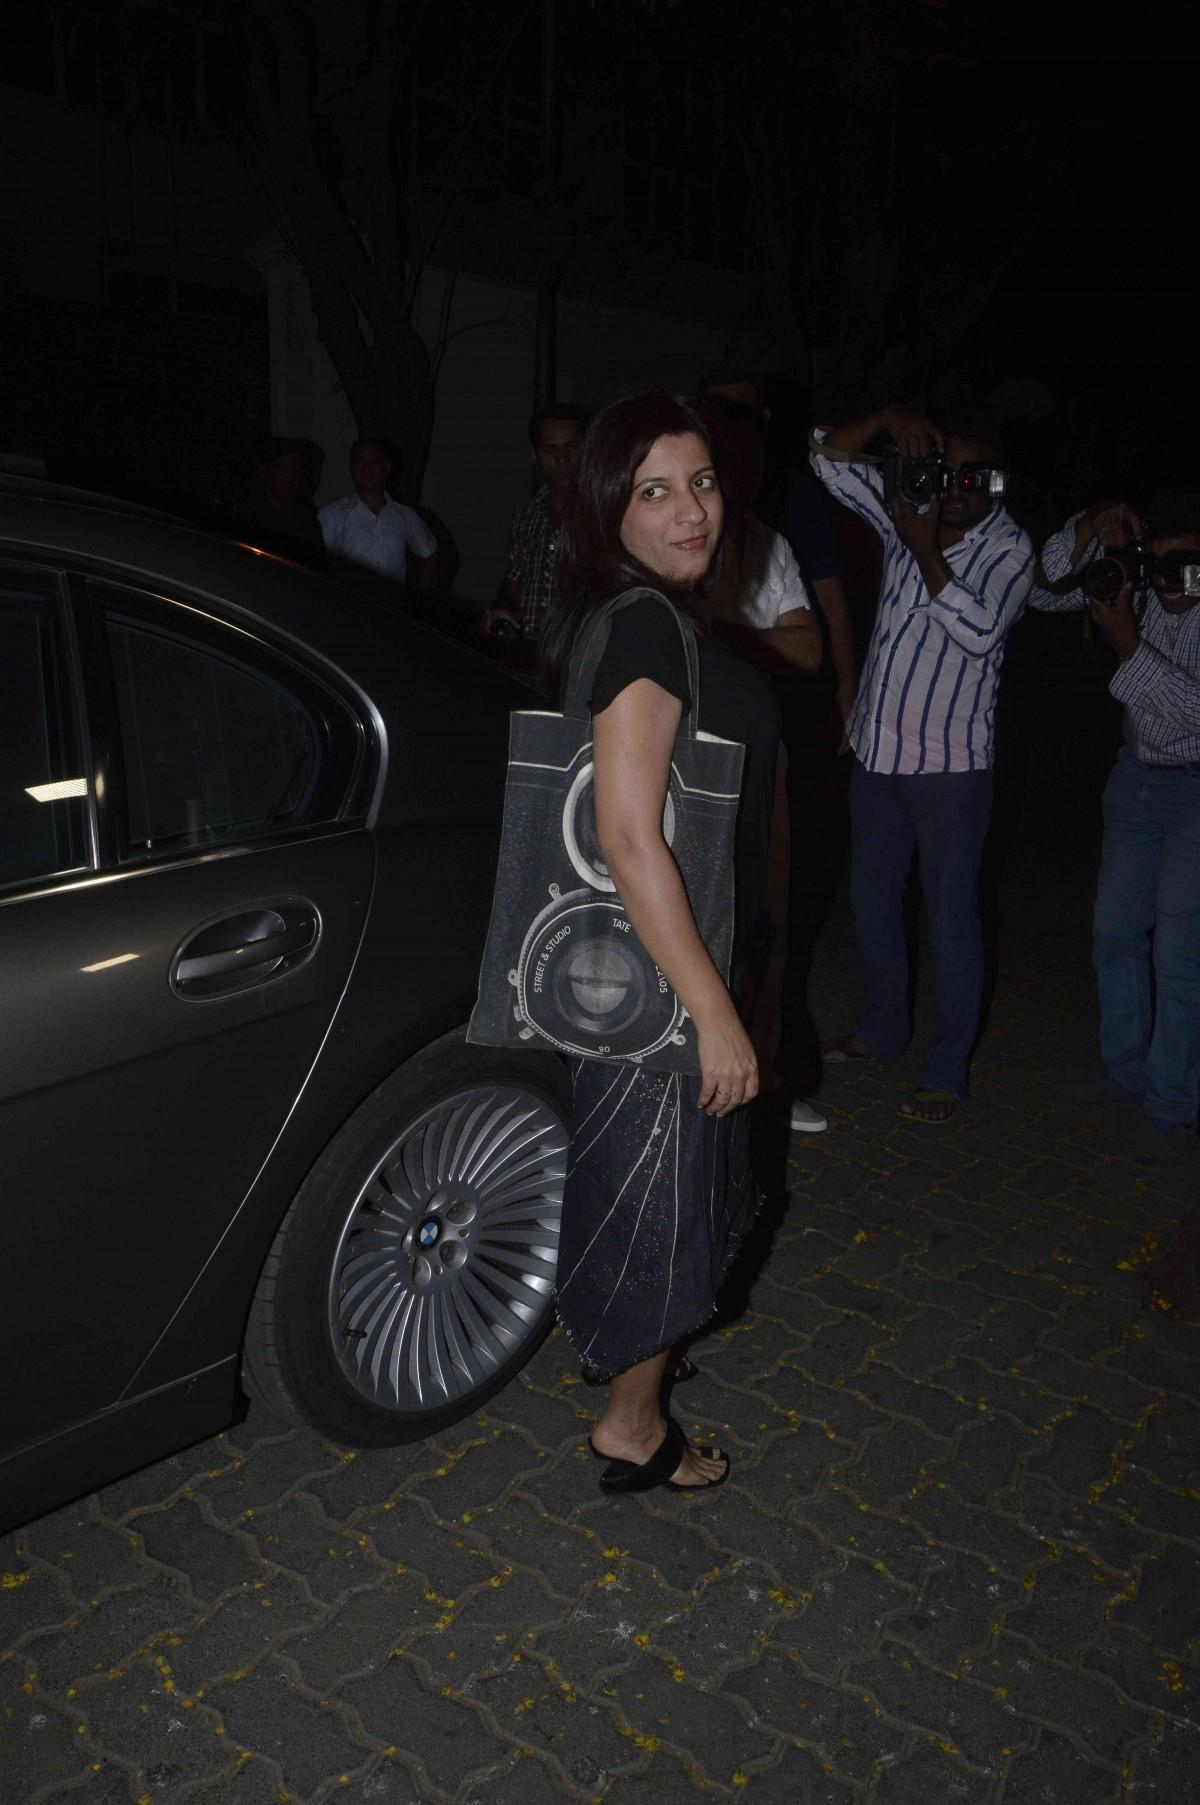 Priyanka Chopra, Arjun Kapoor and Other Celebs Attend Anil Kapoor's 'Dil Dhadakne Do' Bash